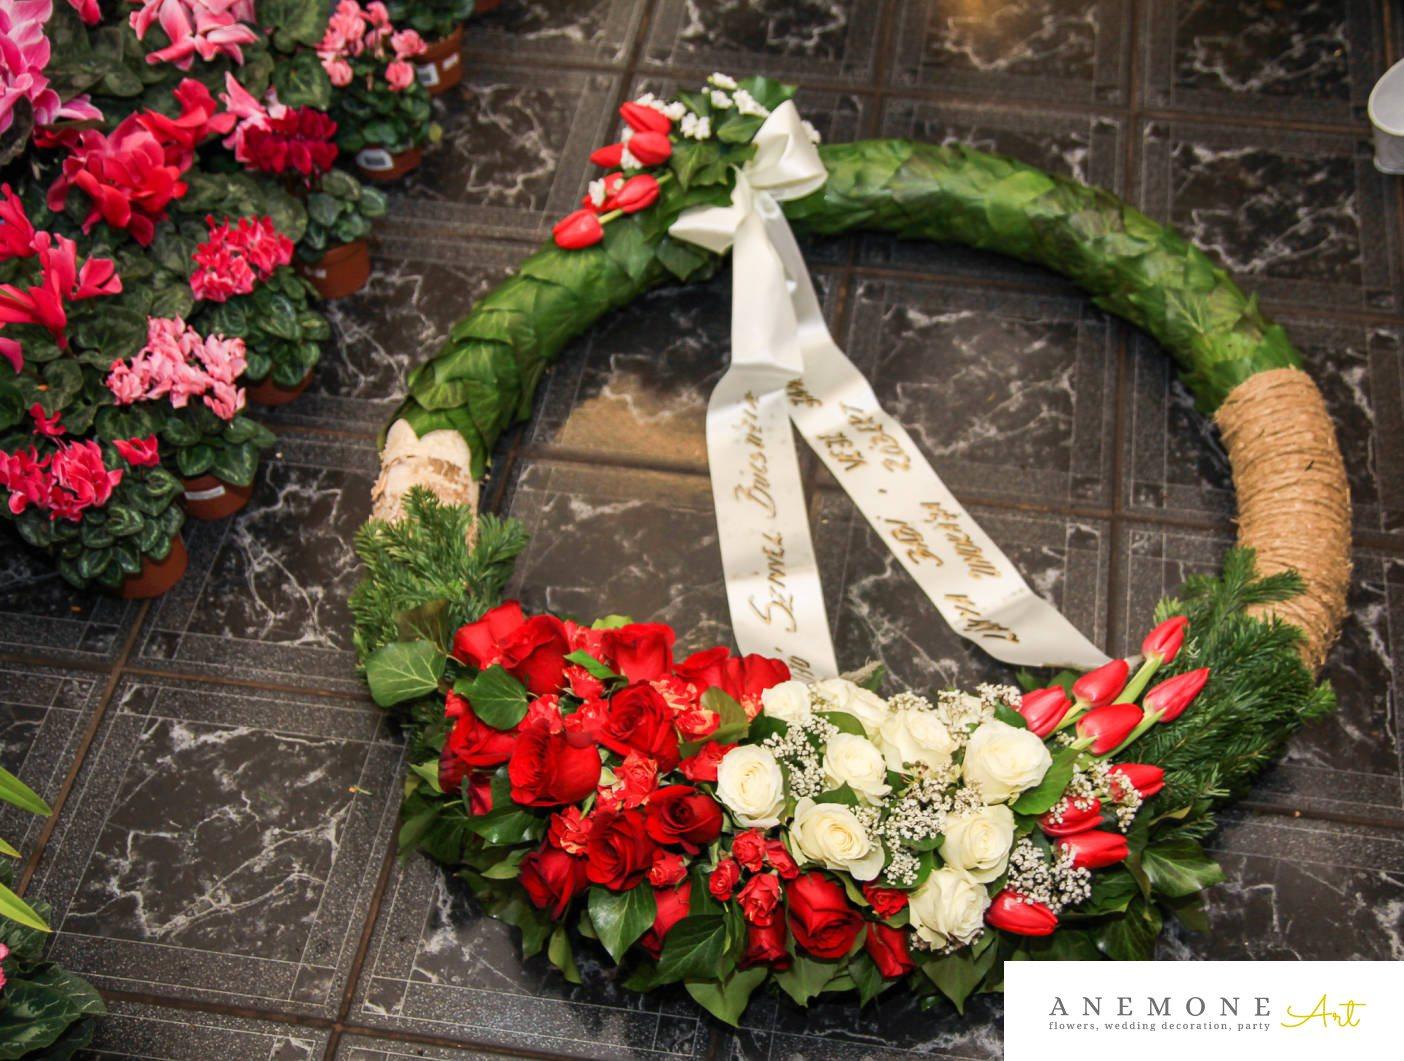 Poza, foto cu Flori de nunta alb, coroana funerara, gipsofila, lalele, mini-rosa, rosu, rotund, trandafiri in Arad, Timisoara, Oradea (wedding flowers, bouquets) nunta Arad, Timisoara, Oradea